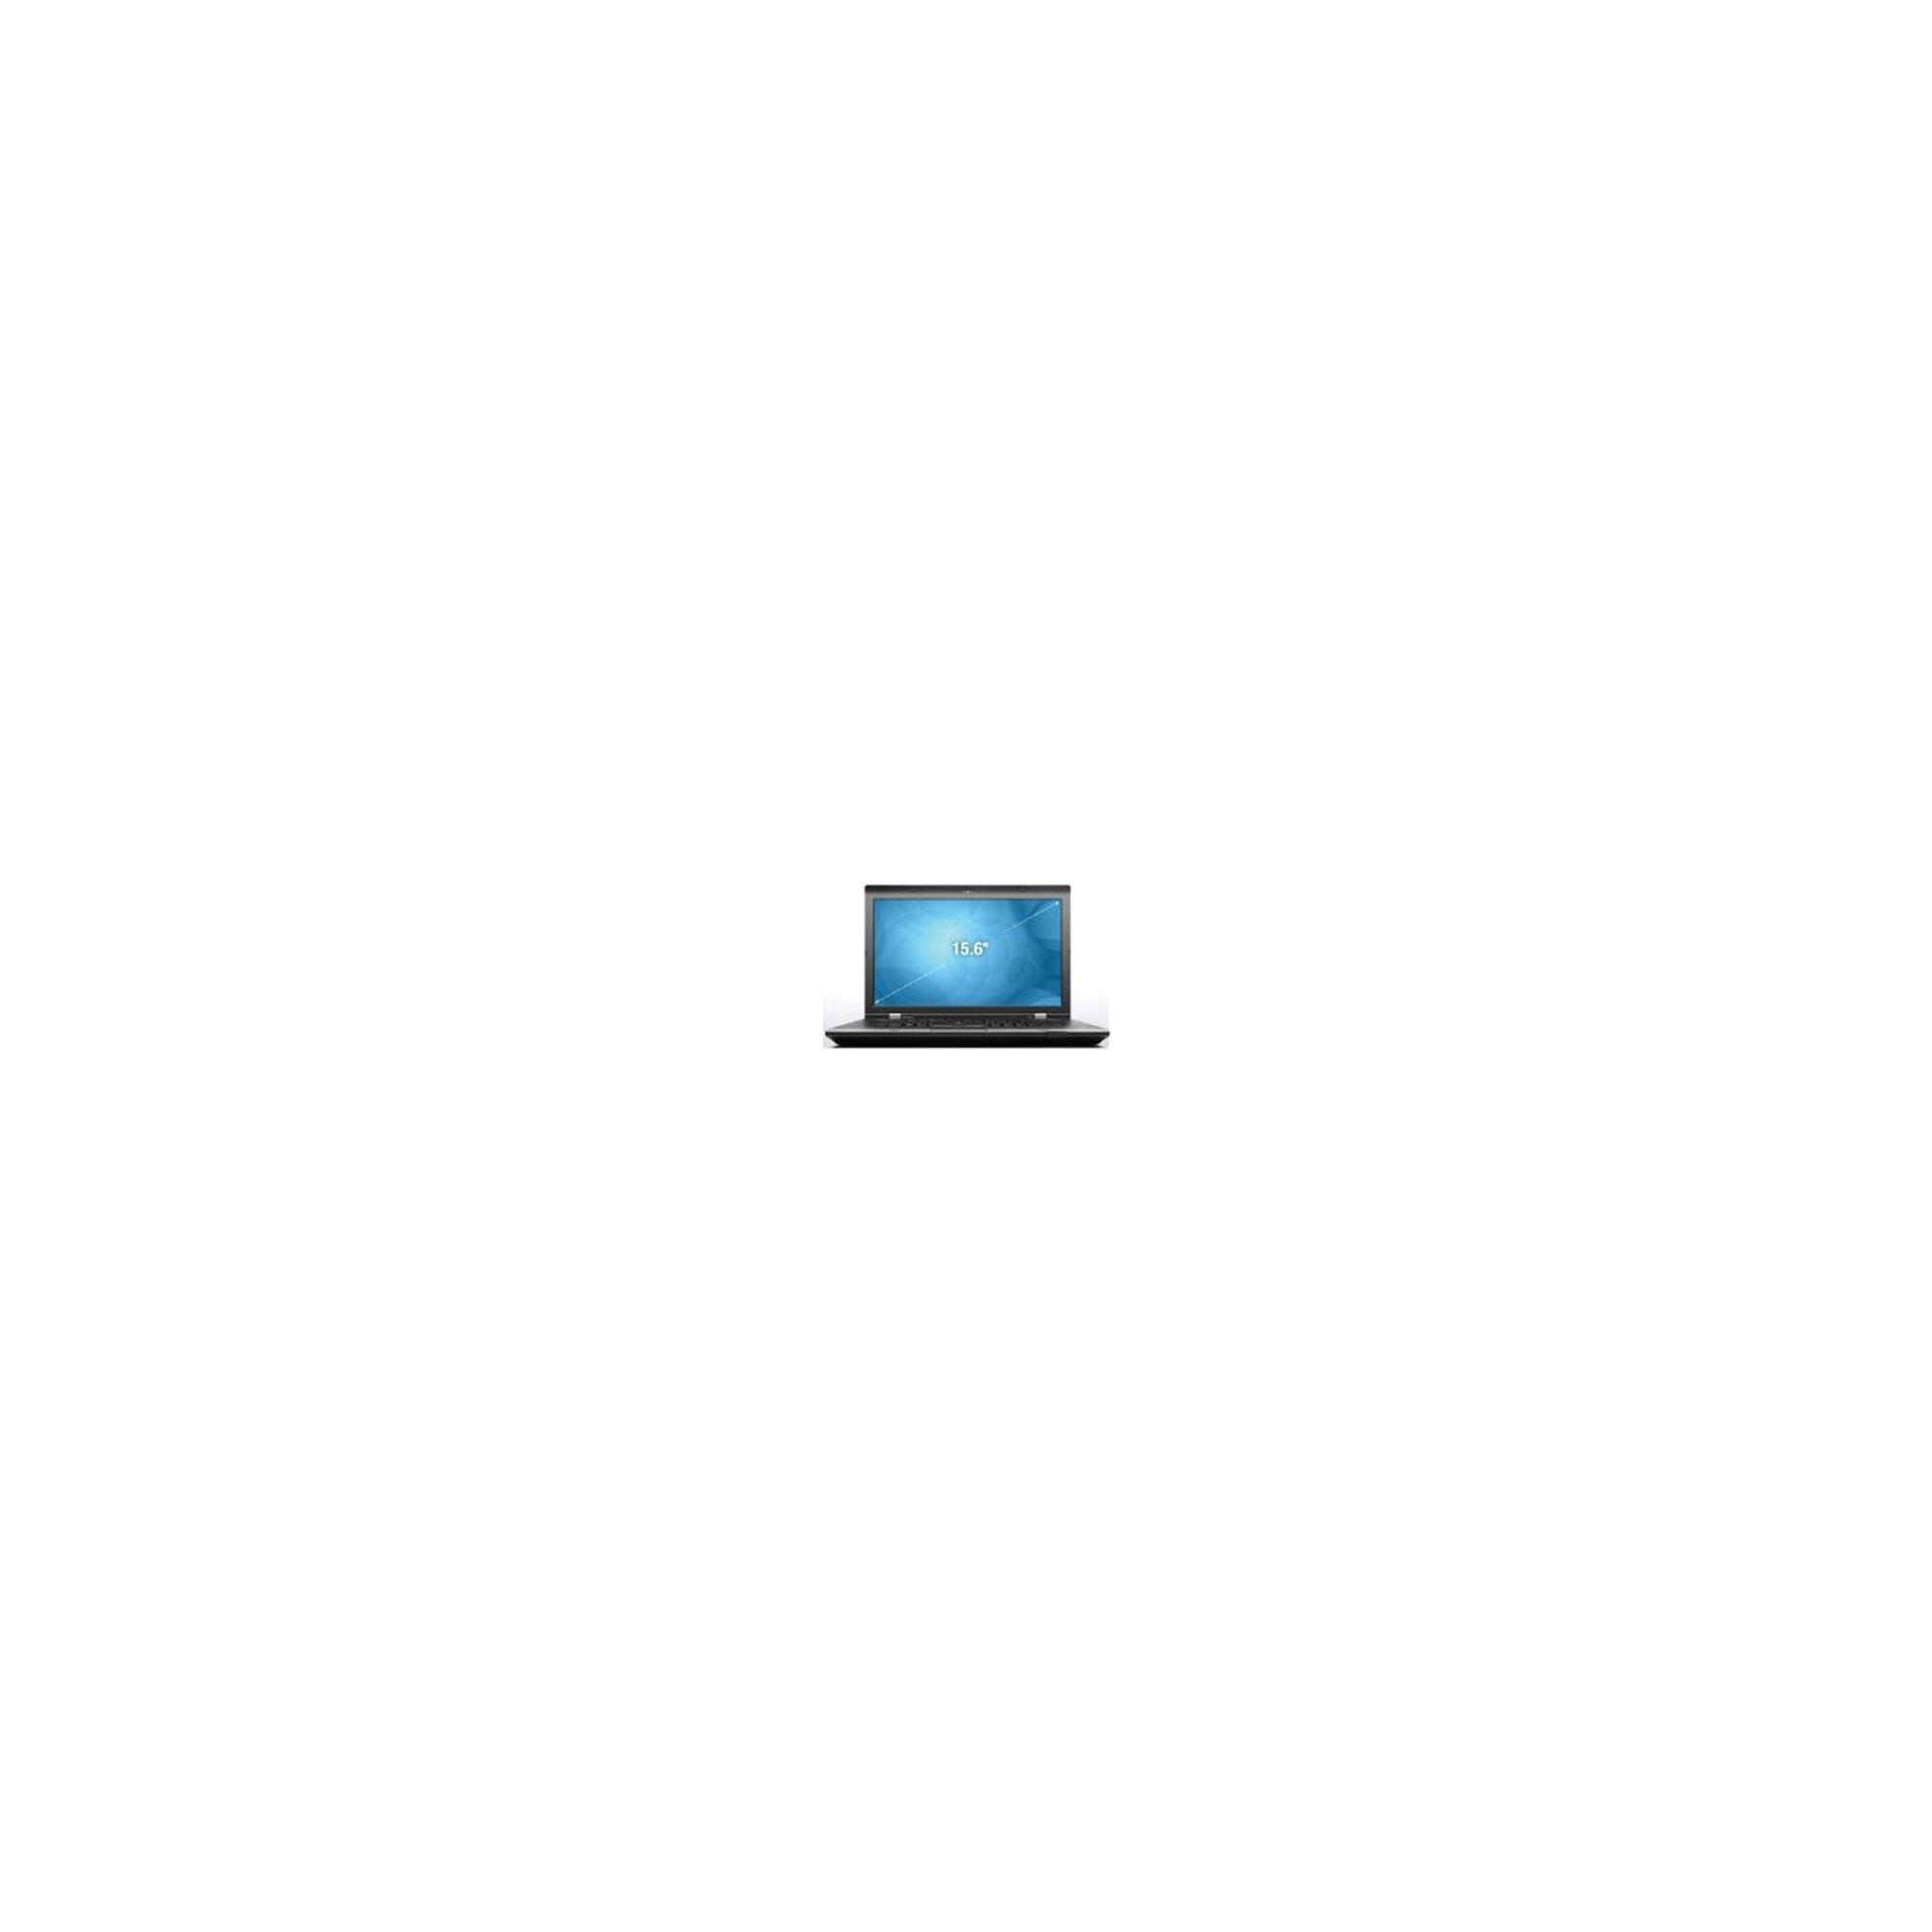 Lenovo ThinkPad L530 24813QG (15.6 inch) Notebook Core i5 (3210M) 2.5GHz 4GB 500GB DVD±RW WLAN BT Webcam Windows 7 Pro 64-bit/Windows 8 Pro RDVD at Tesco Direct